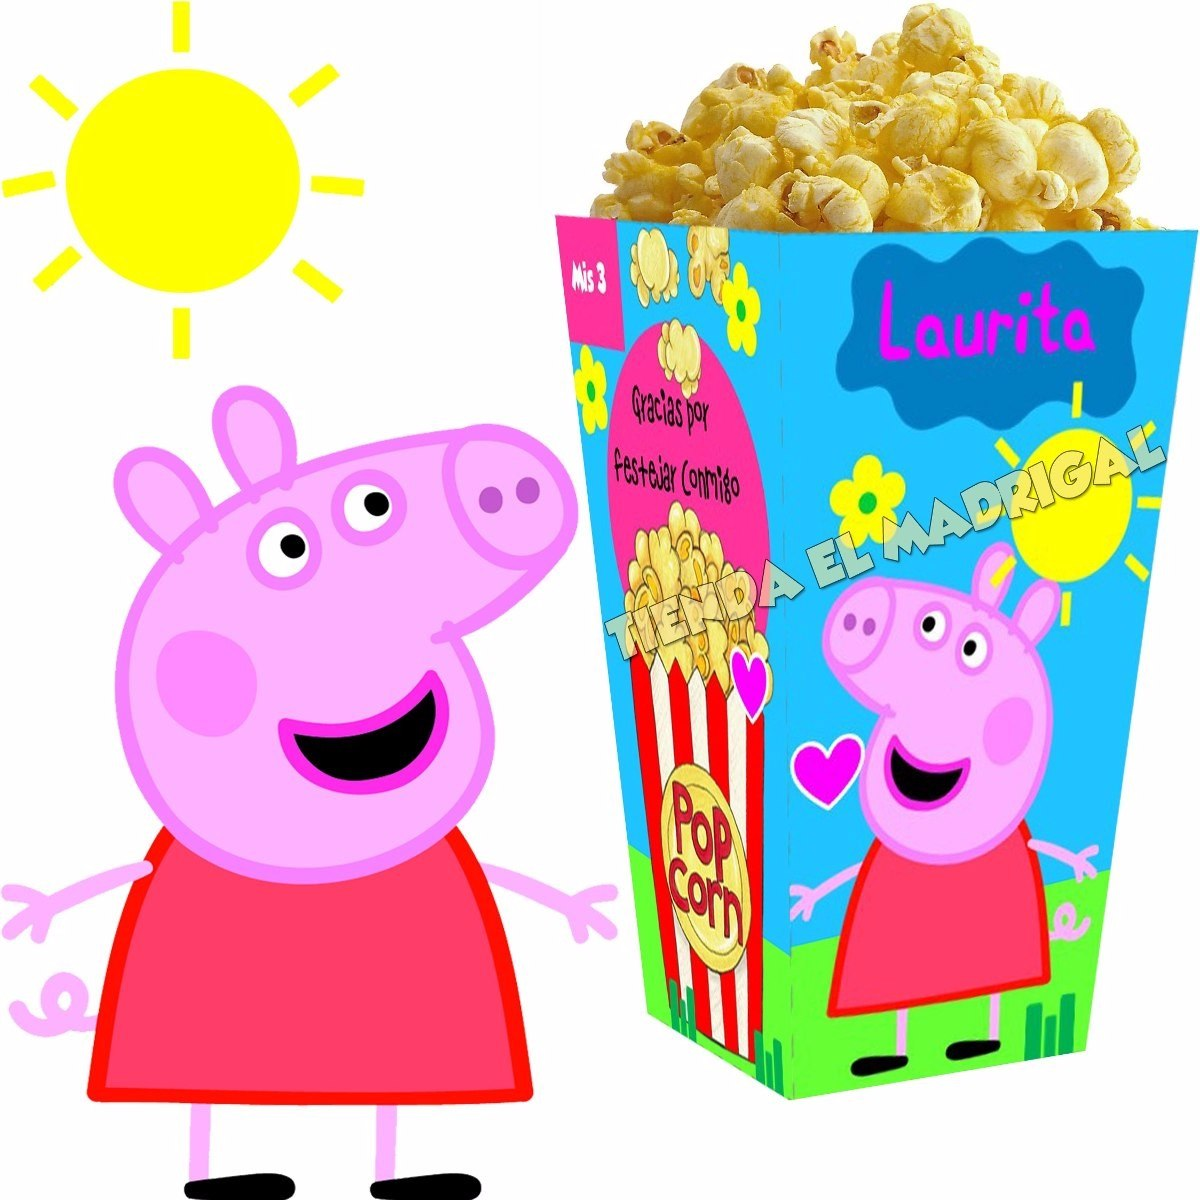 Decoracion Cumplea?os Peppa Pig ~ Kit Imprimible Peppa Pig Decoraciones Para Fiesta Cumplea?os  $ 99